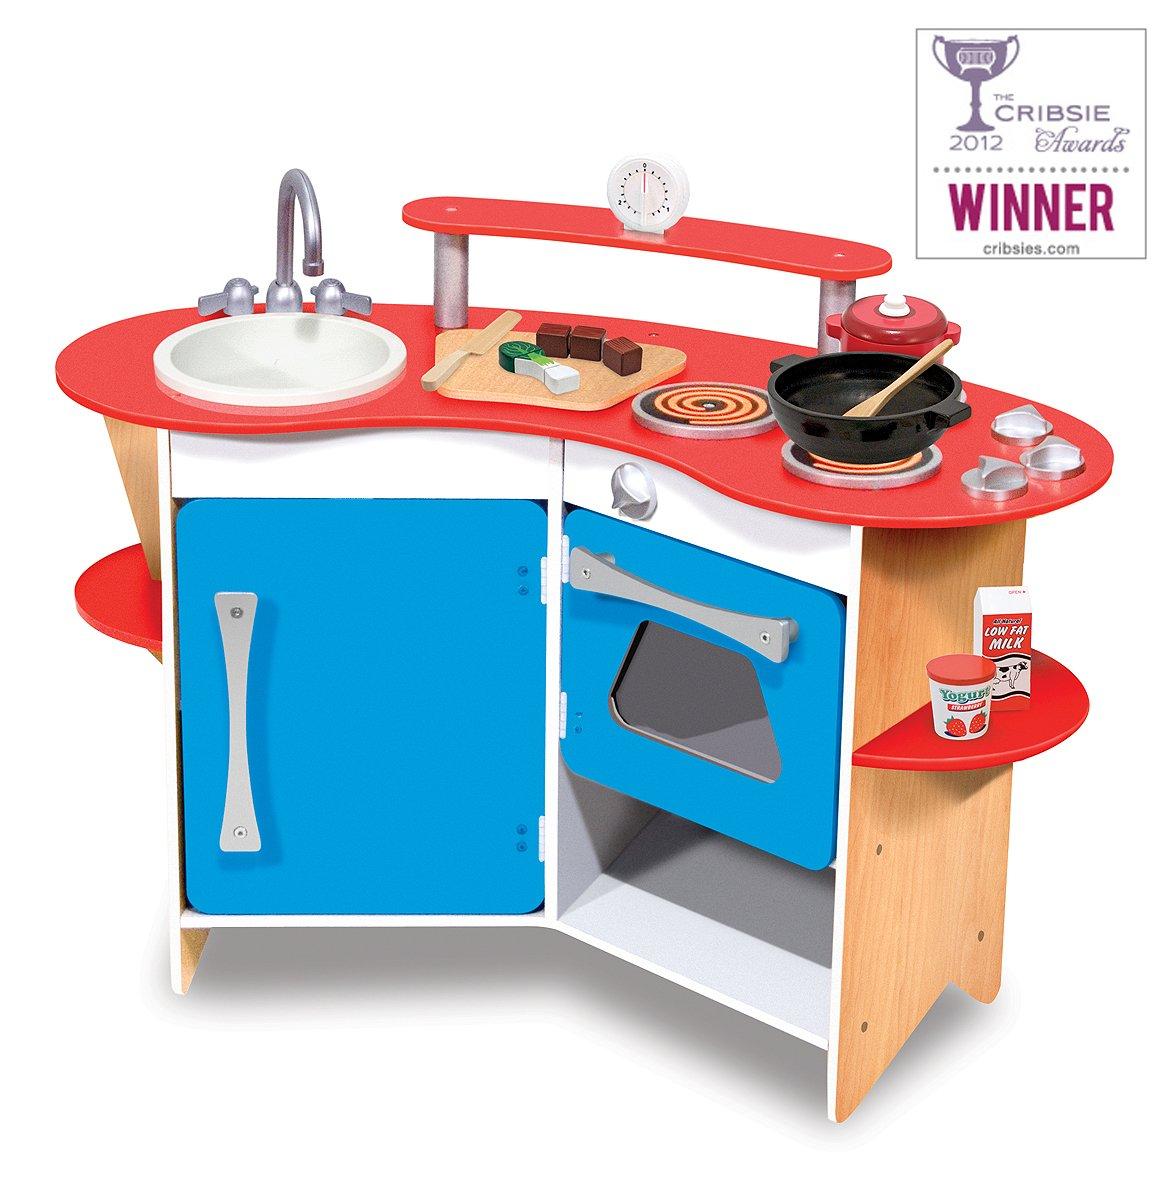 Amazon.com: Melissa & Doug Cook\'s Corner Wooden Pretend Play Toy ...